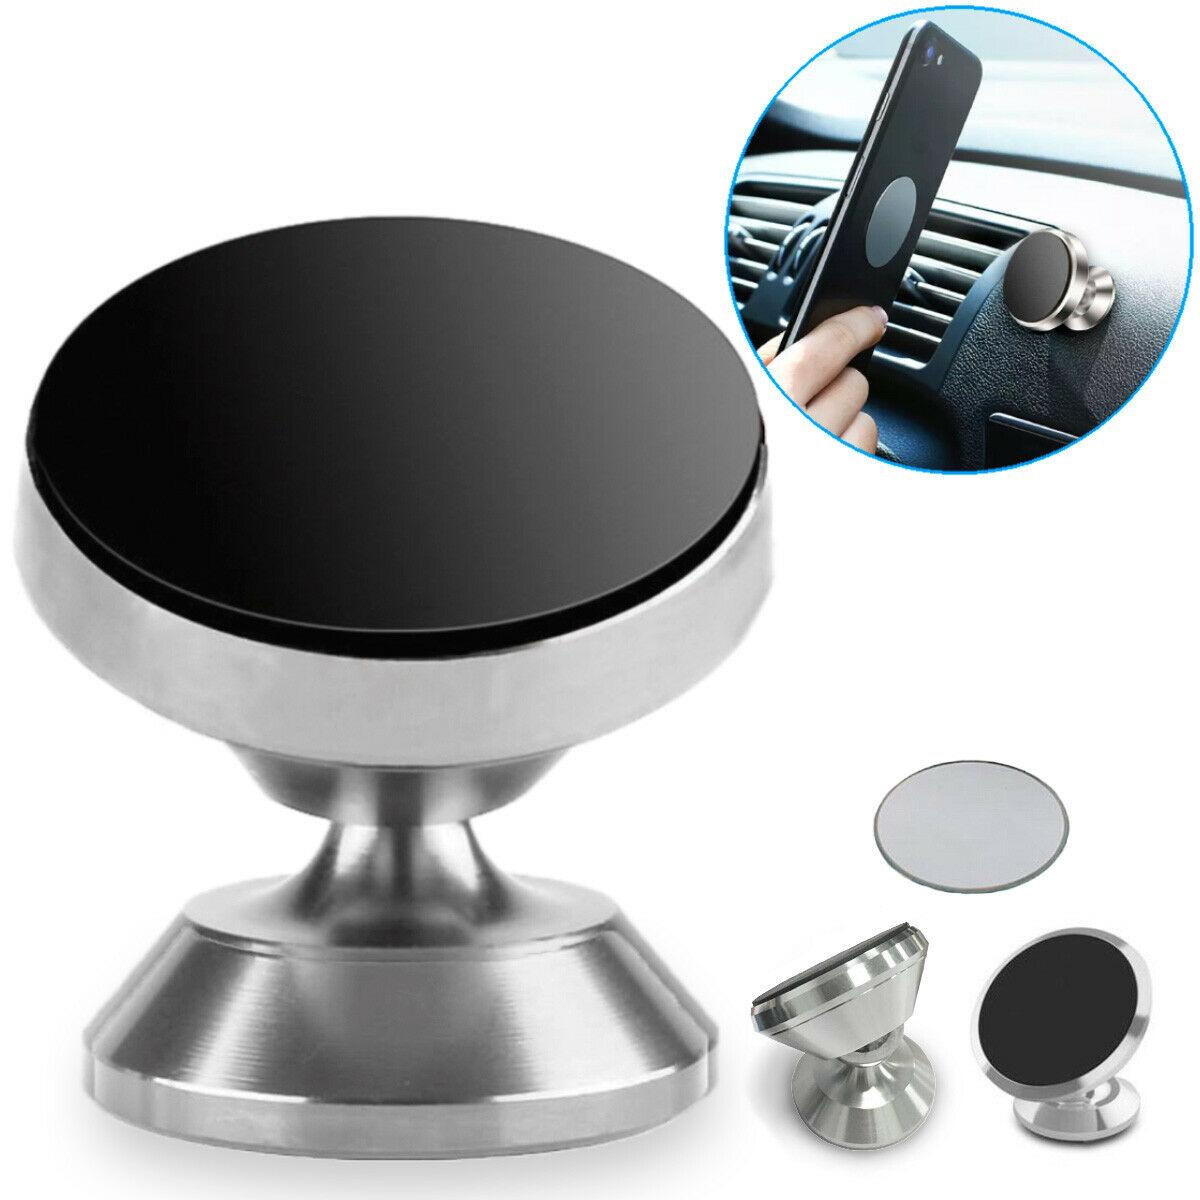 magnet halterung smartphone kfz armaturenbrett 360. Black Bedroom Furniture Sets. Home Design Ideas